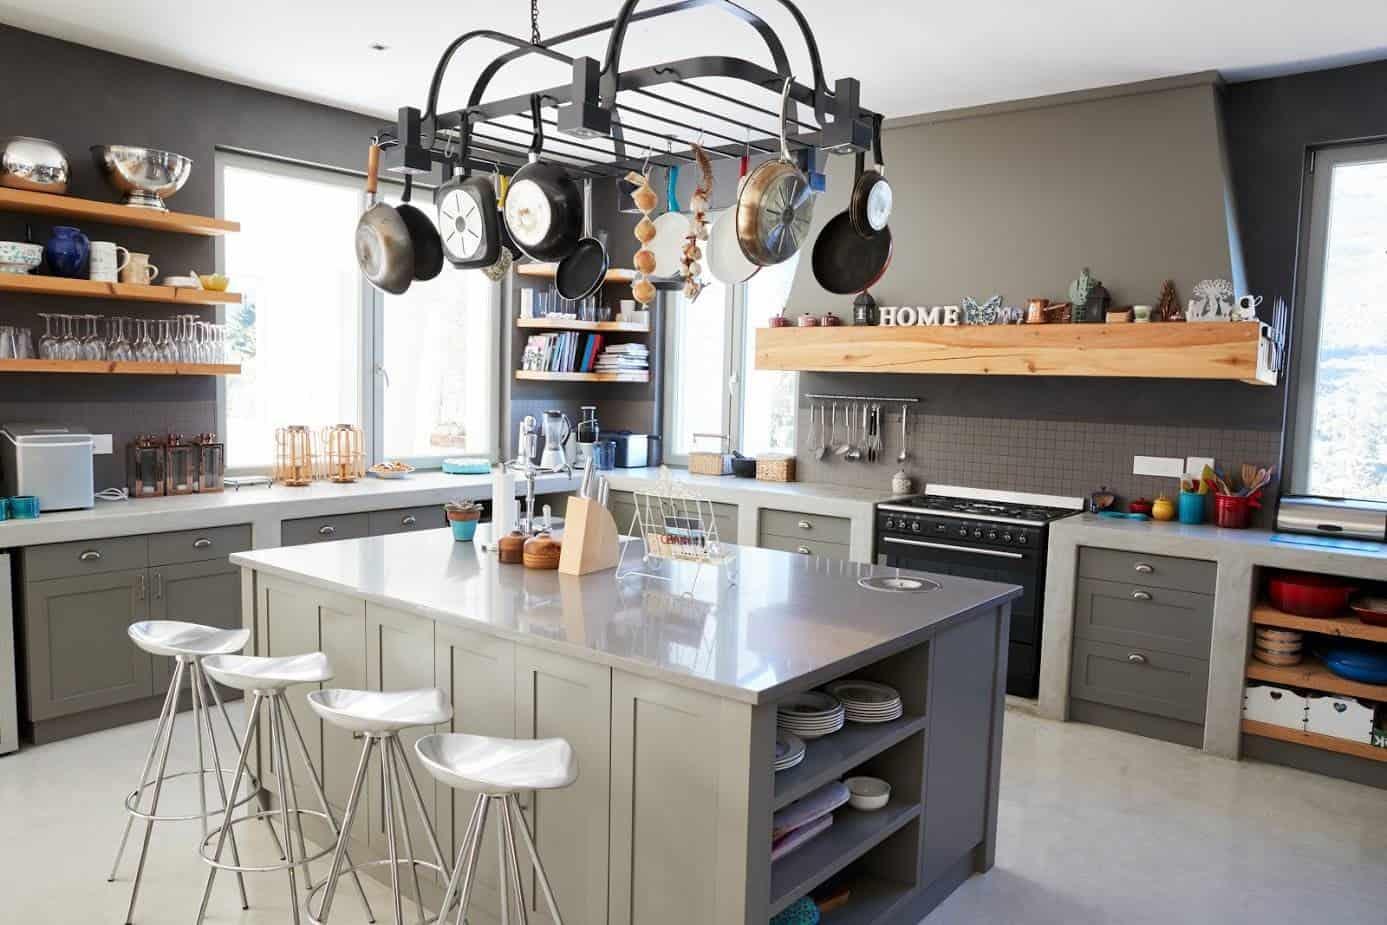 Customising a Bespoke Kitchen Island